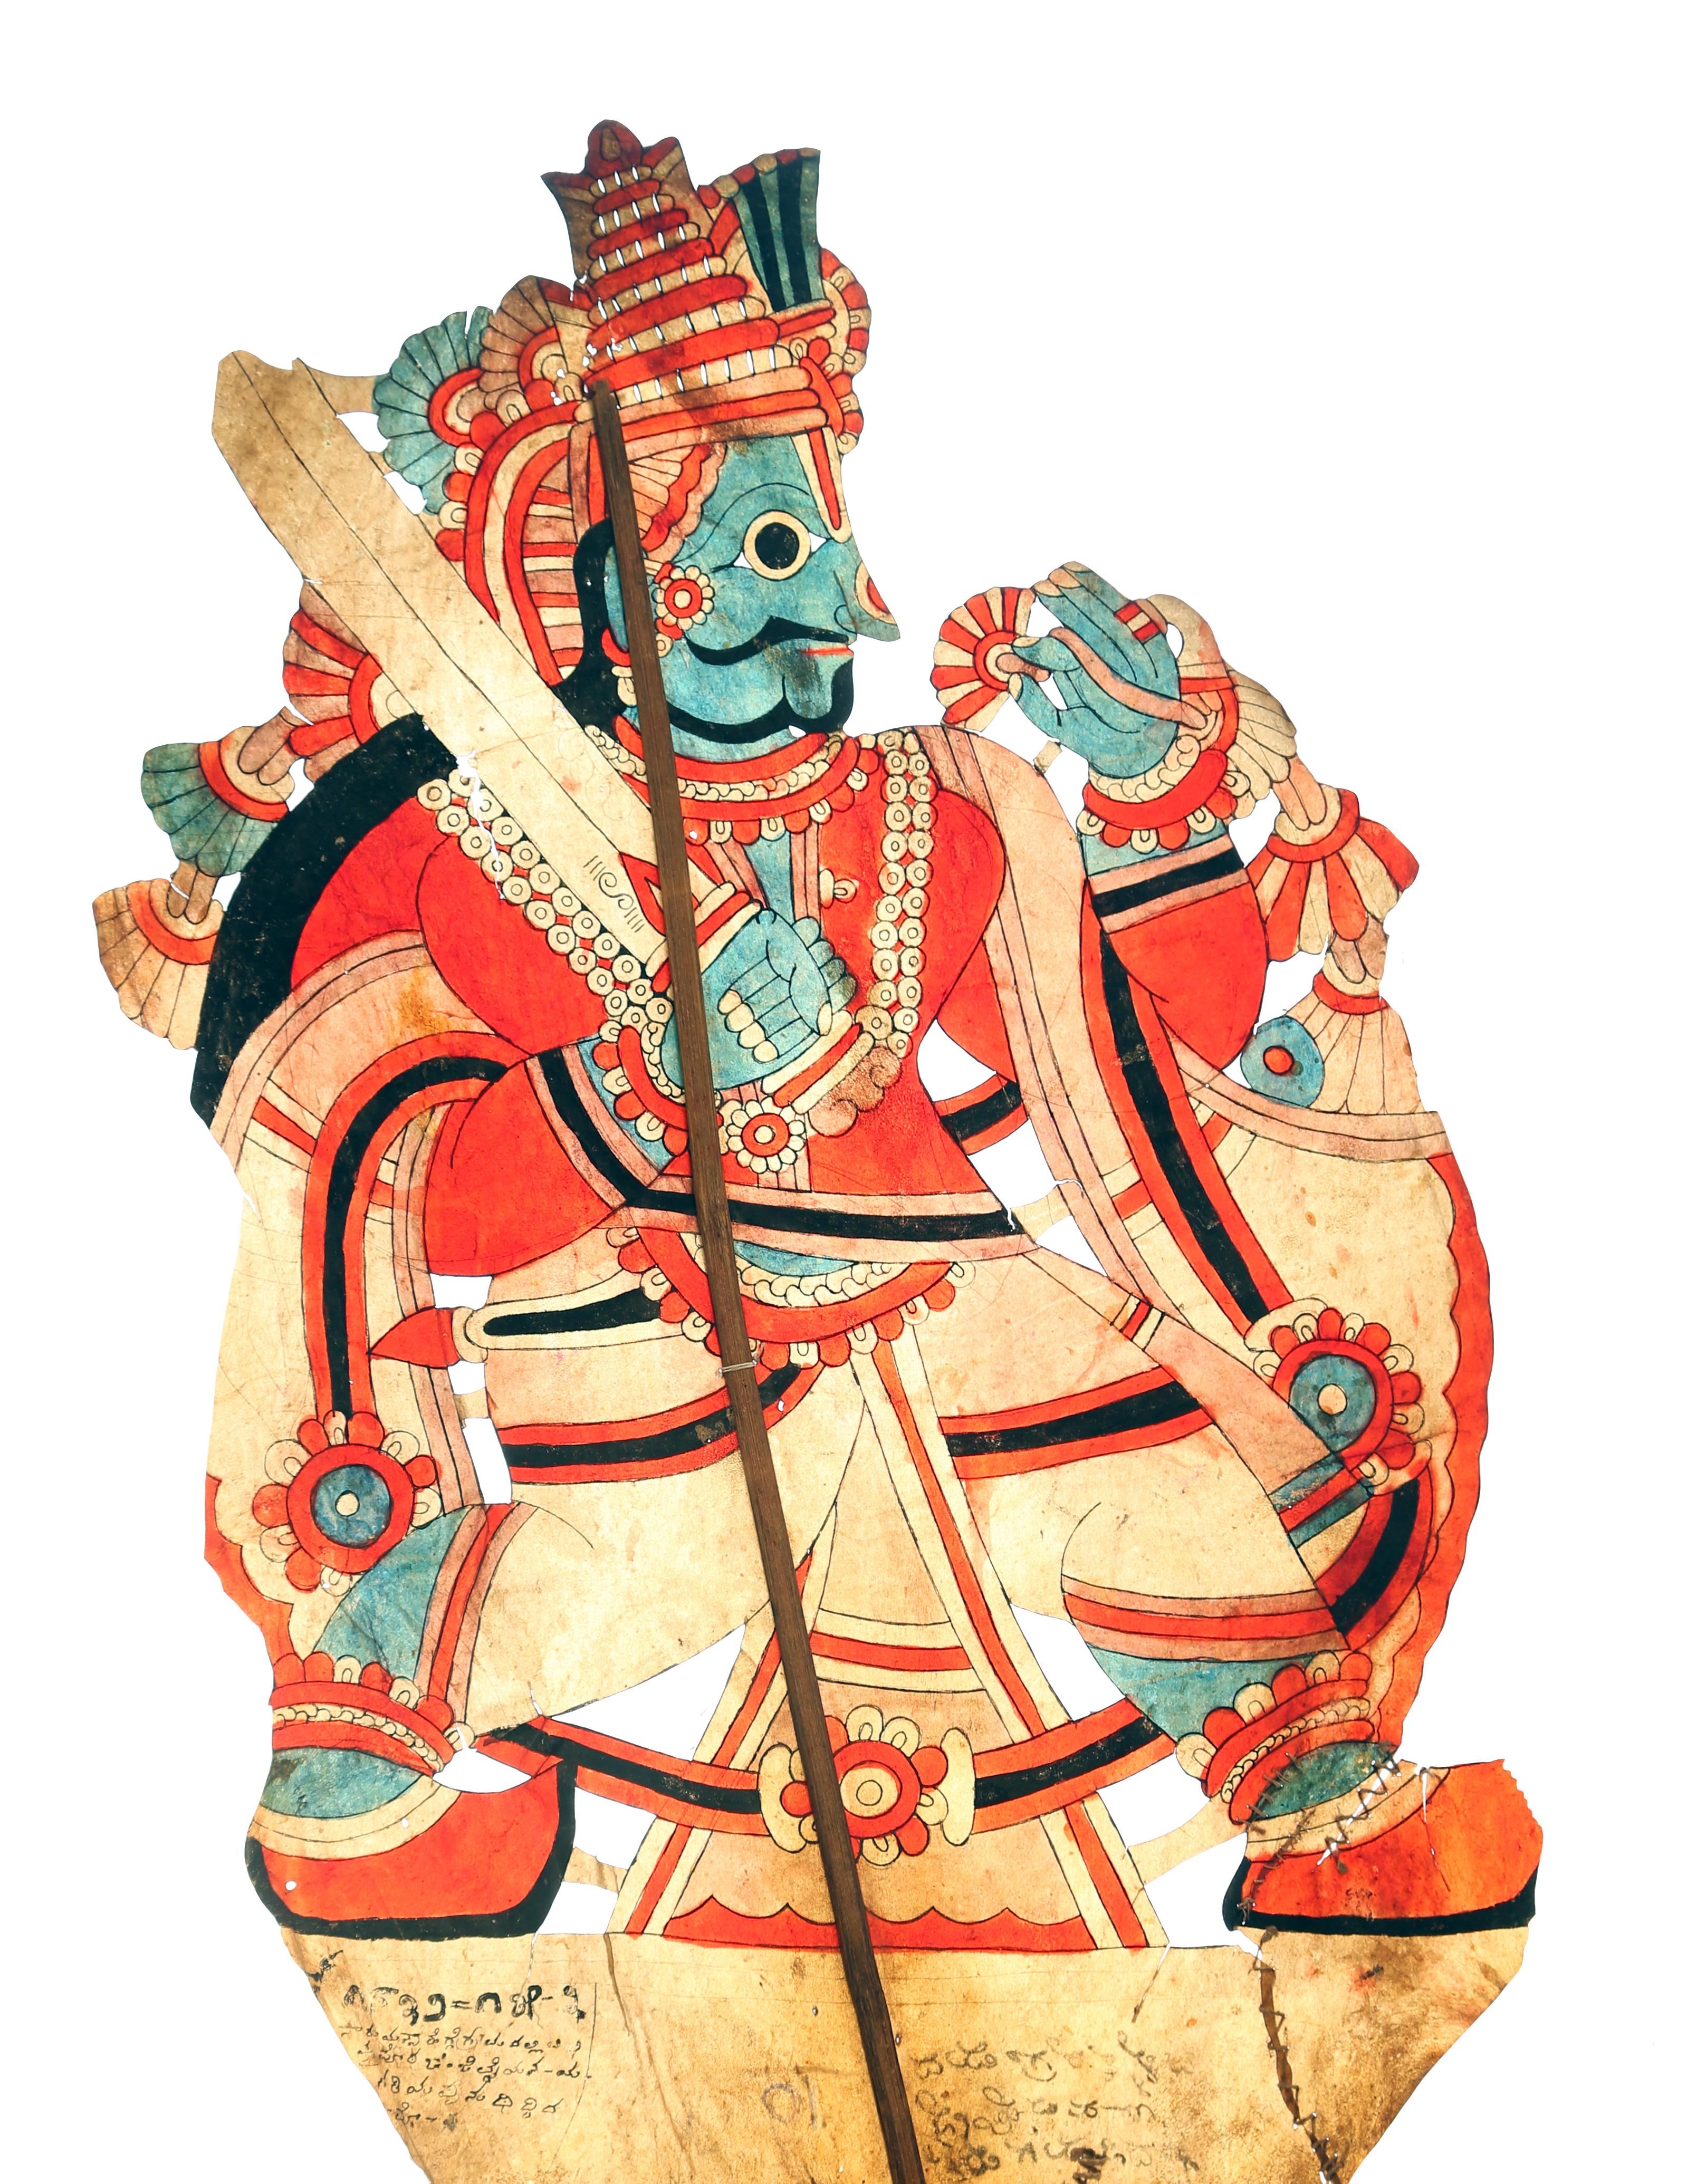 Râma, le personnage principal du Râmâyana, créé par Gunduraju (Hassan, Karnataka), un maître du théâtre d'ombres, togalu gombeya</em>ta</em>, de Karnataka, en Inde